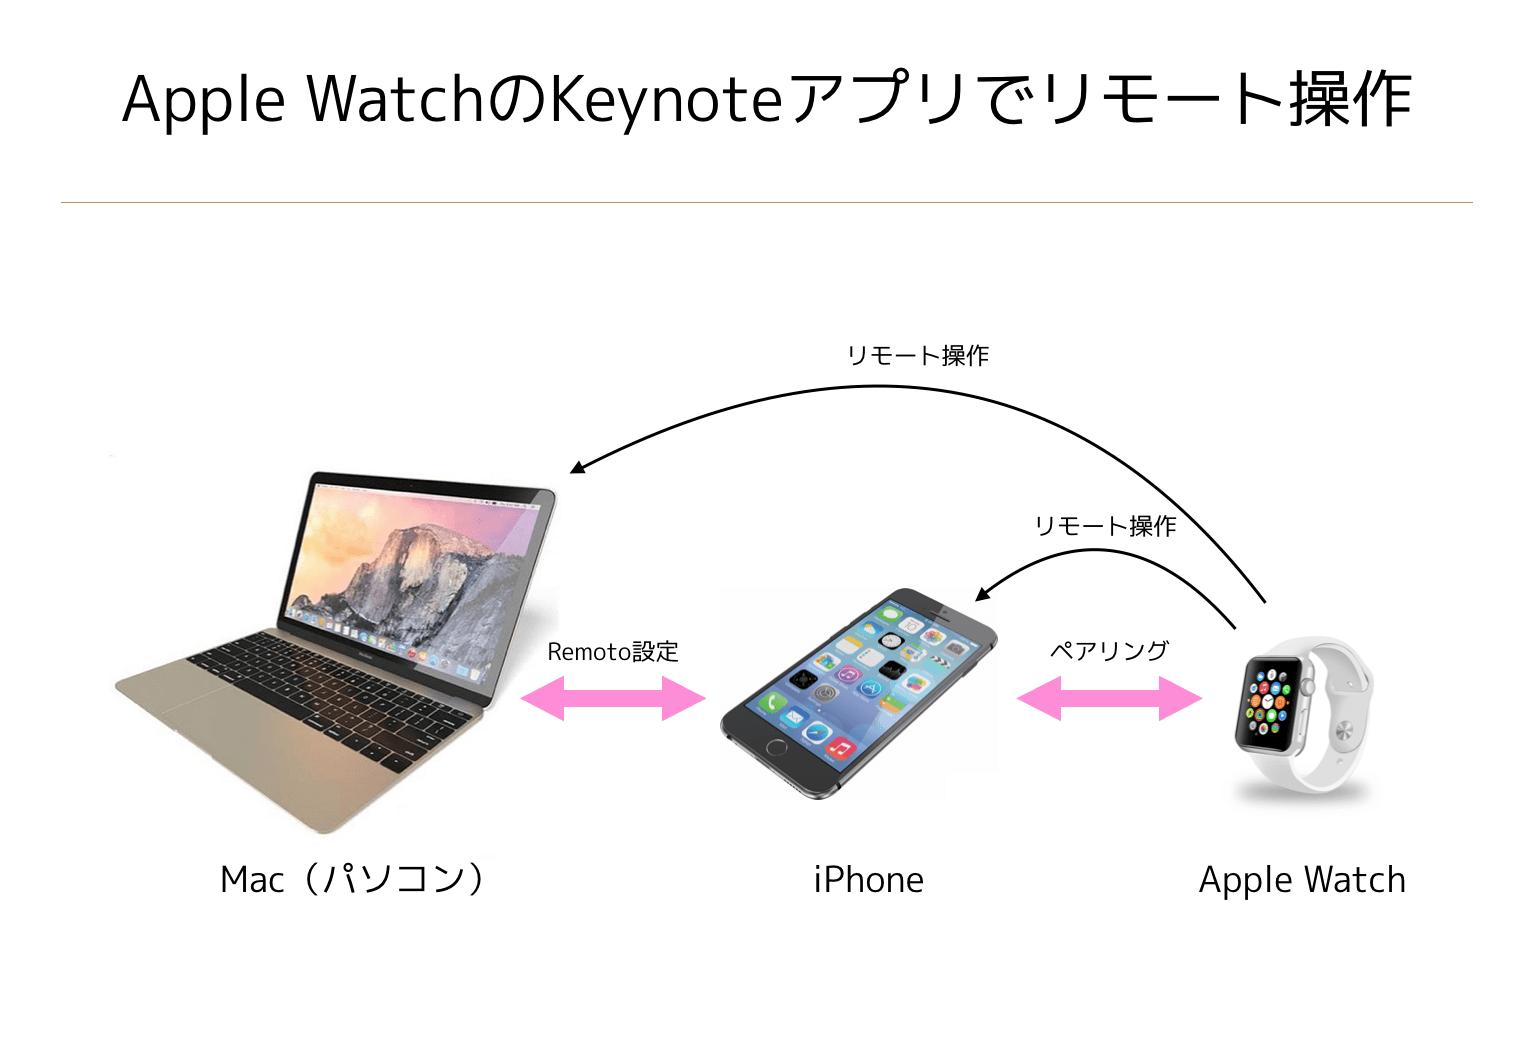 Apple WatchのKeynoteアプリでリモート操作